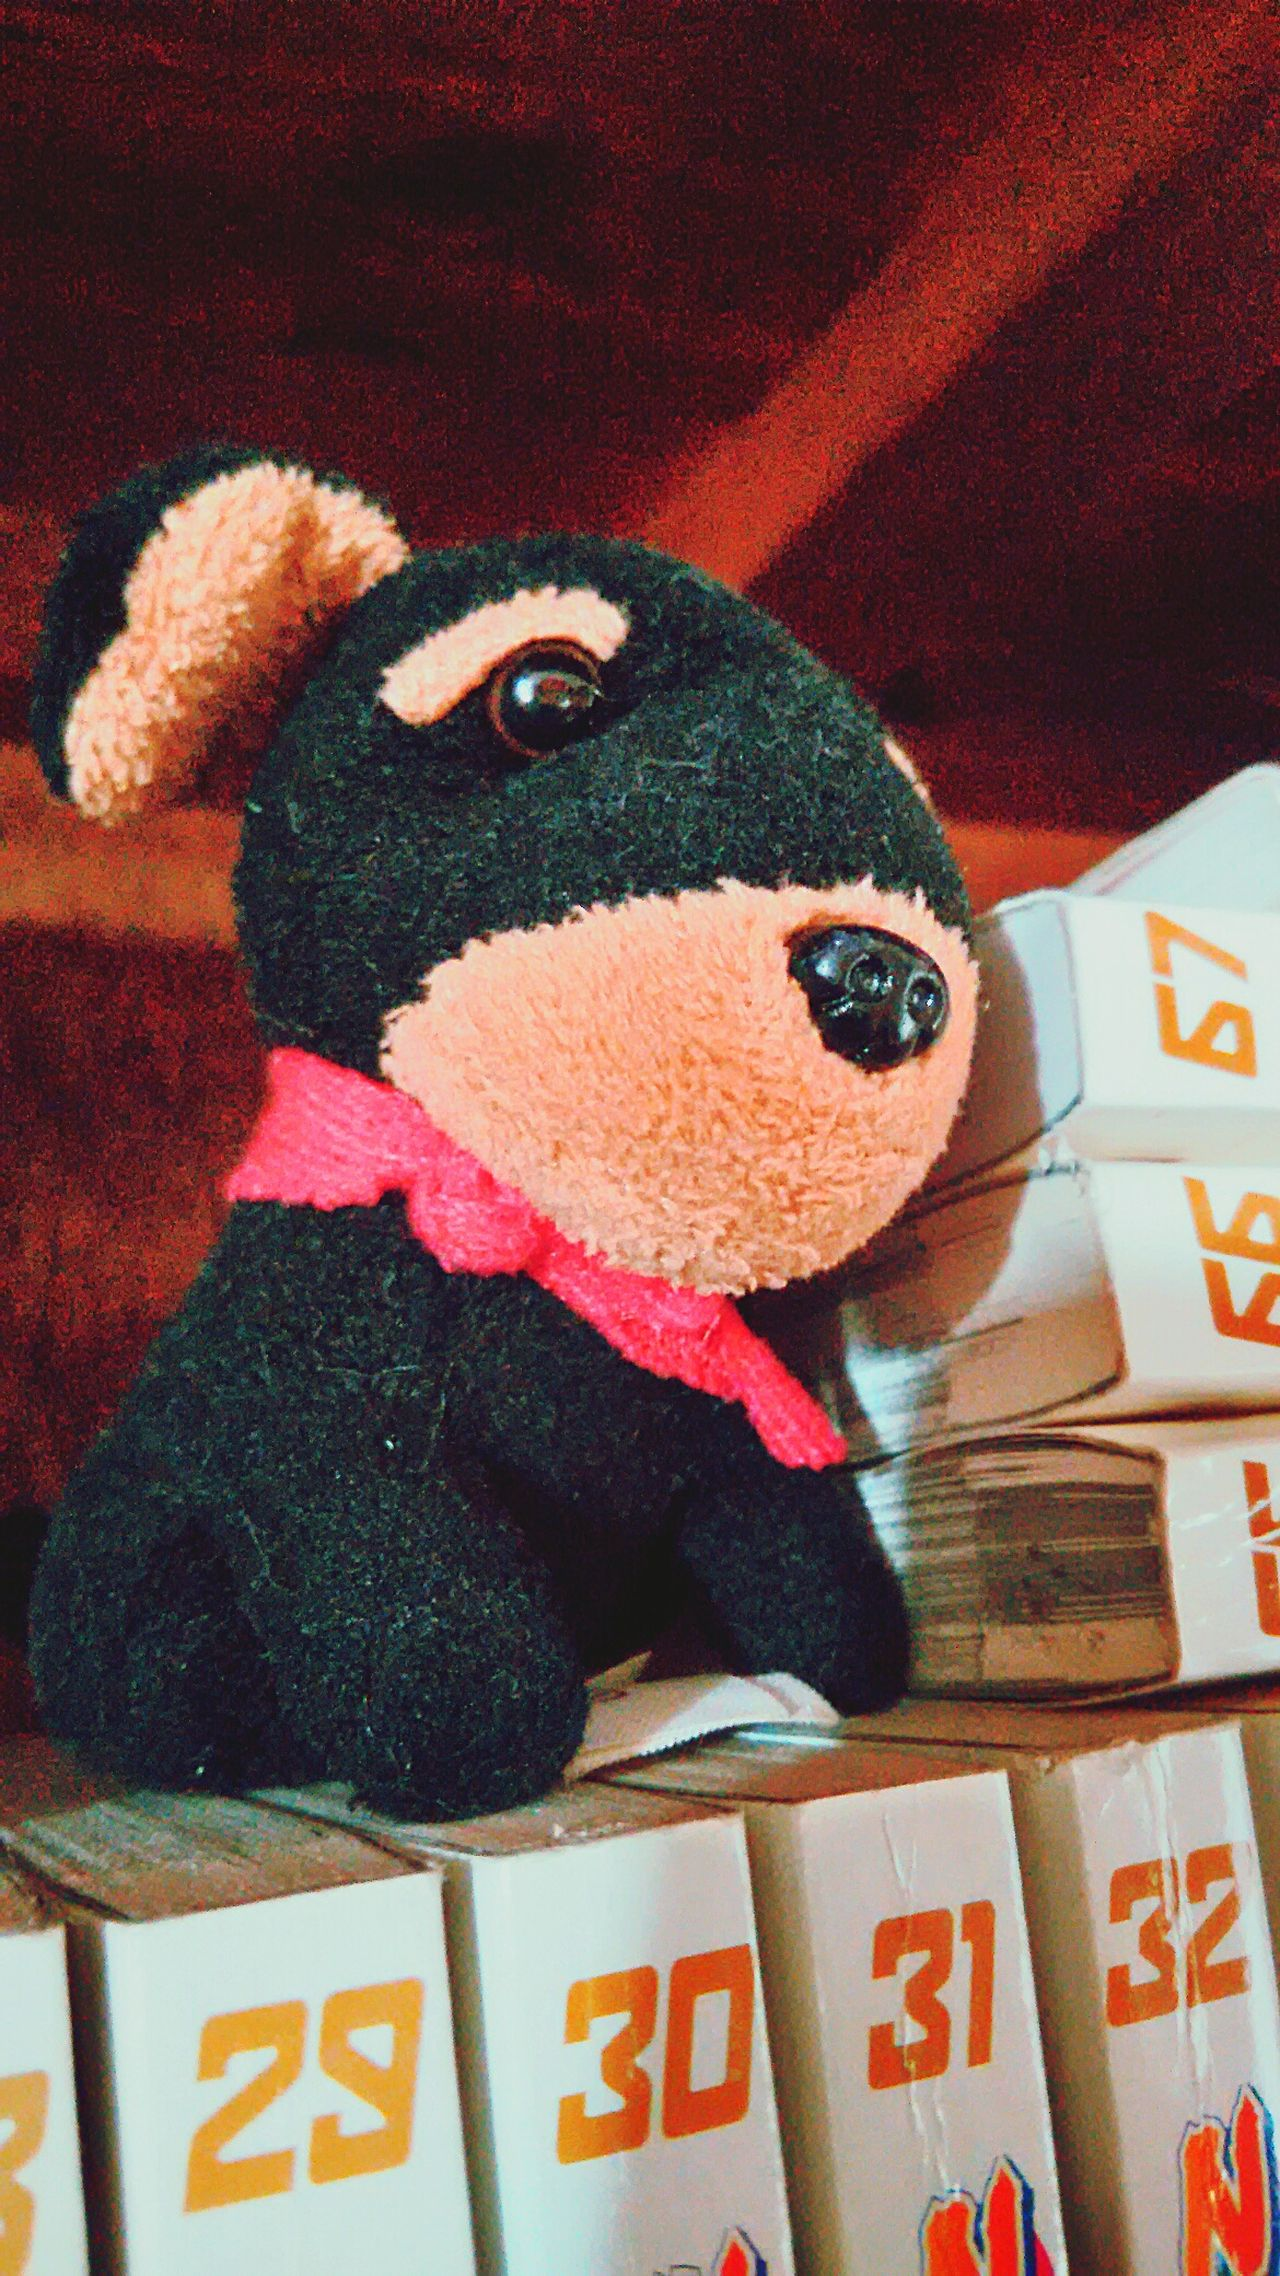 Little Erwin🐕💞 Home Is Where The Art Is Home Decor Home Design Manga Peluche Pelouche Dogs Of EyeEm Childhood Memories Asus Zenfone Photography Indoors  Showcase March Harusphotos Eyeemphotography Still Life Photography Relaxing @ Home EyeEm Best Shots Eyeem School Of Photography OpenEditCreativ